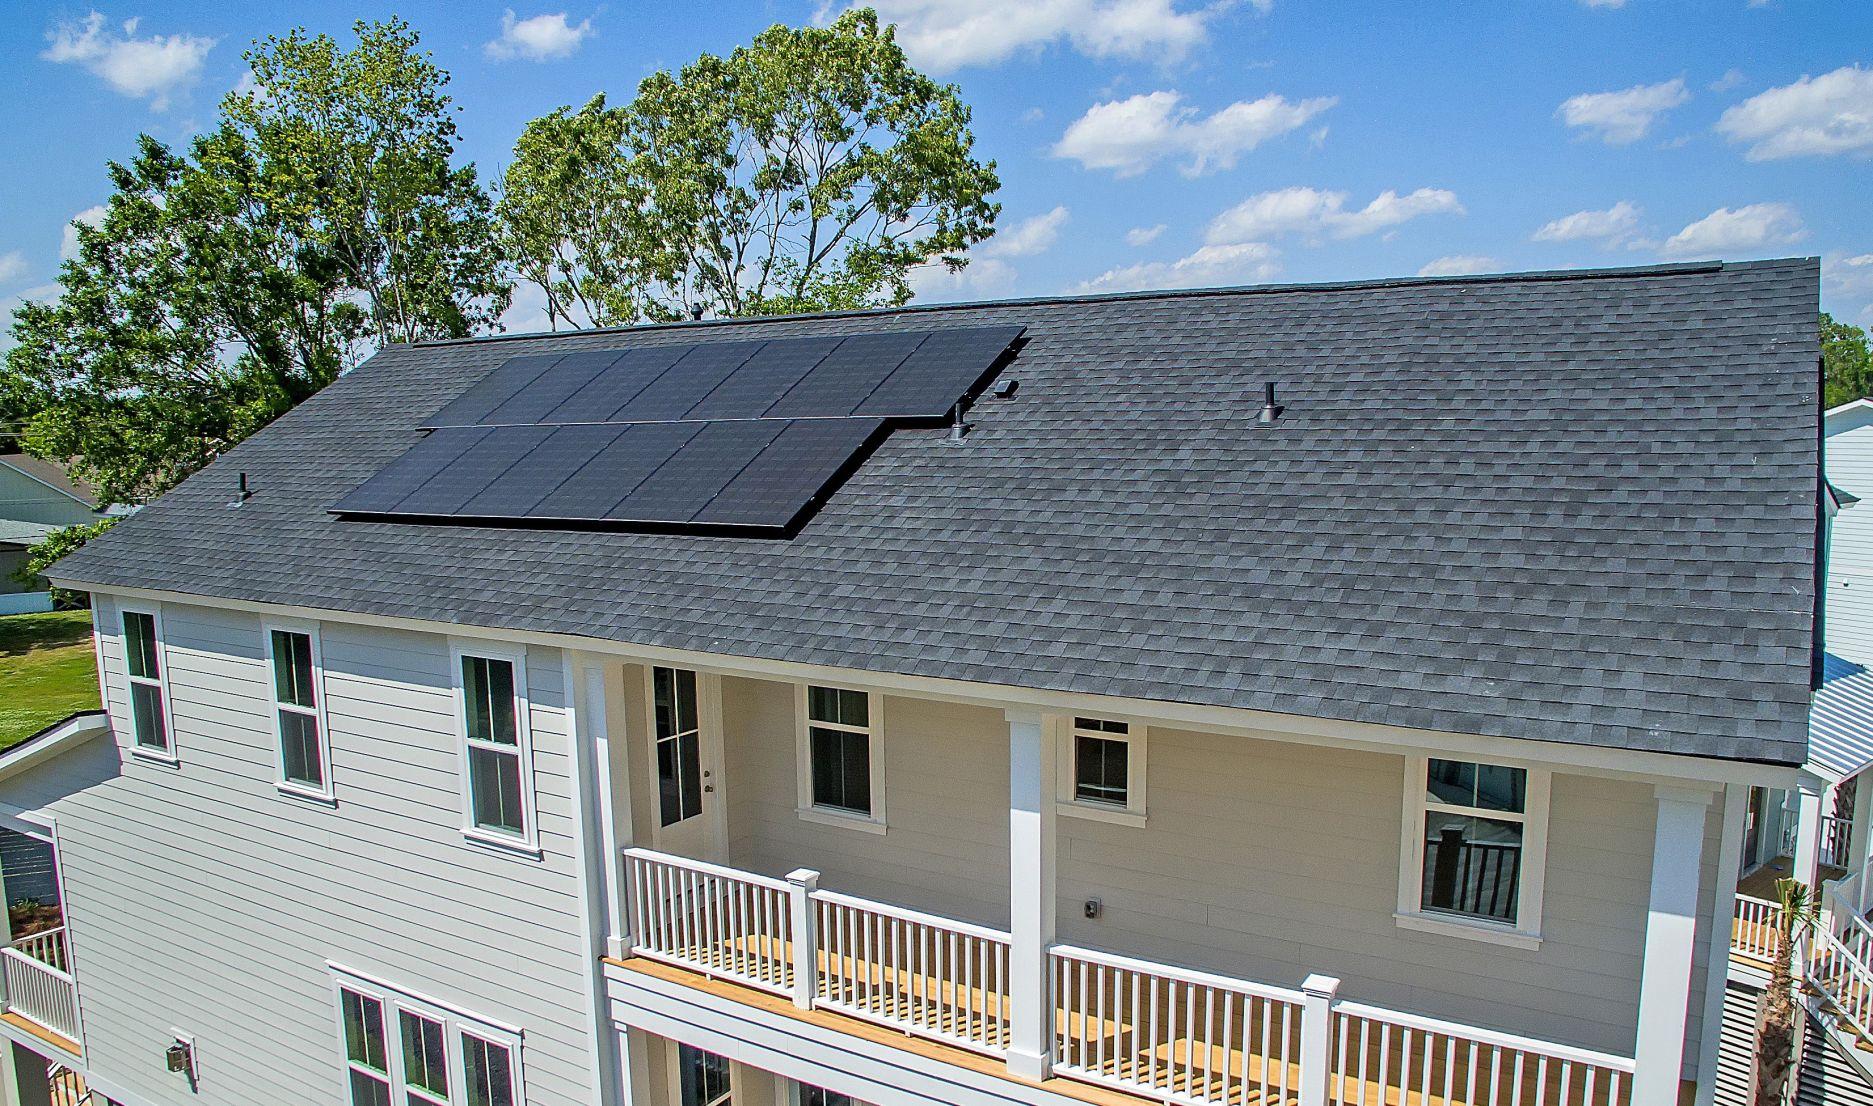 environmentally pristine energy efficient homes gain traction jim rh postandcourier com